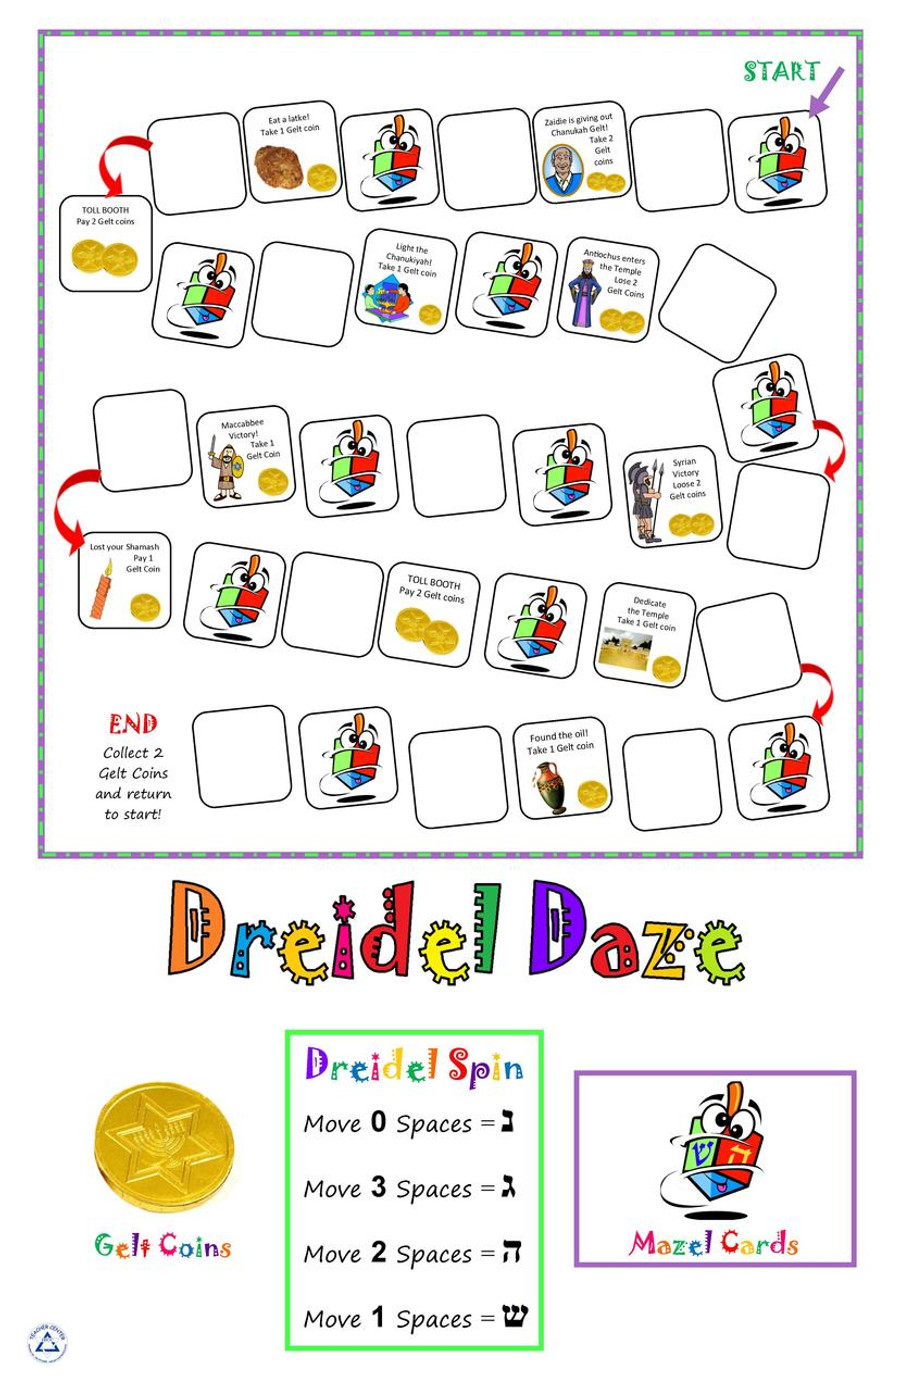 Dreidel Daze